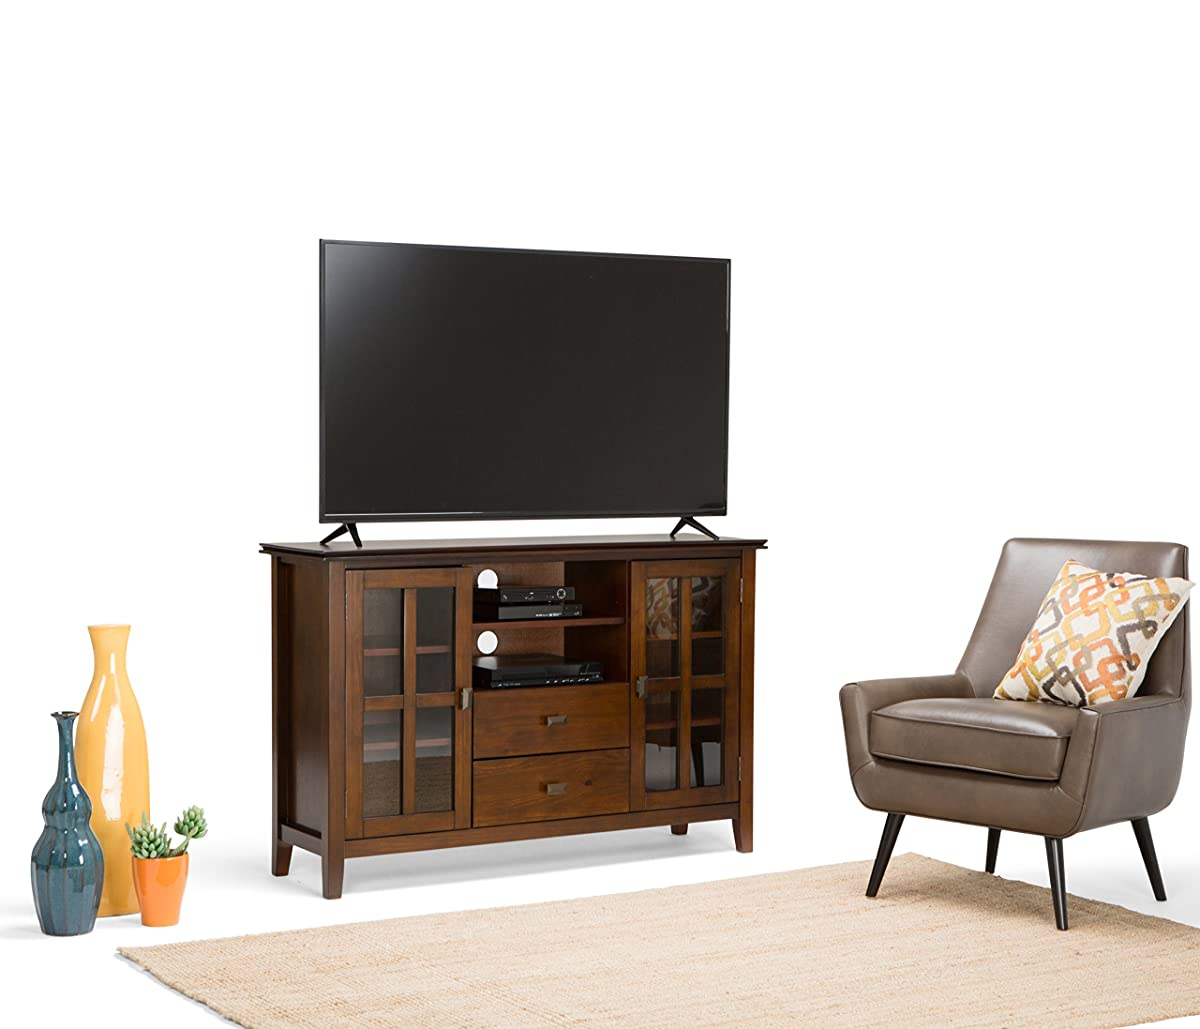 "Simpli Home Artisan TV Media Stand for TVs up to 60"", Medium Auburn Brown"